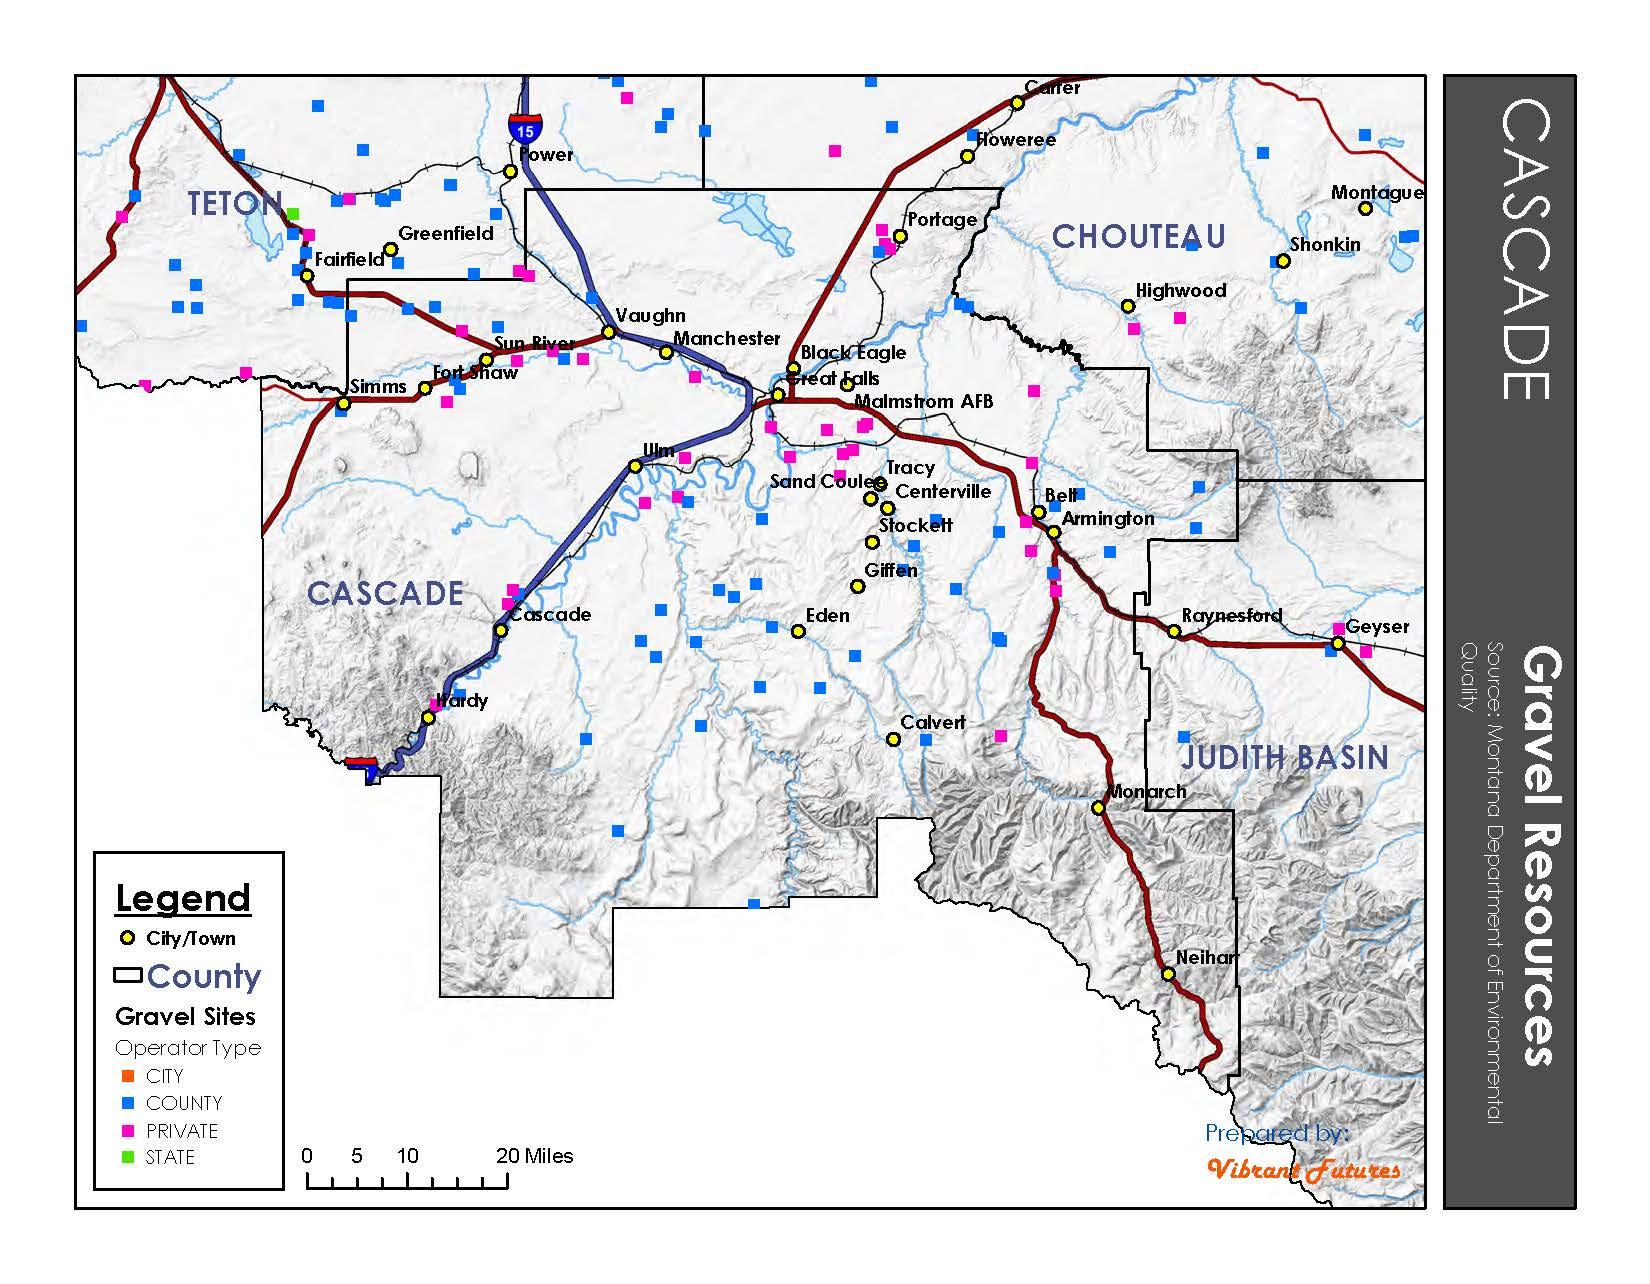 Gravel Resources Cascade County